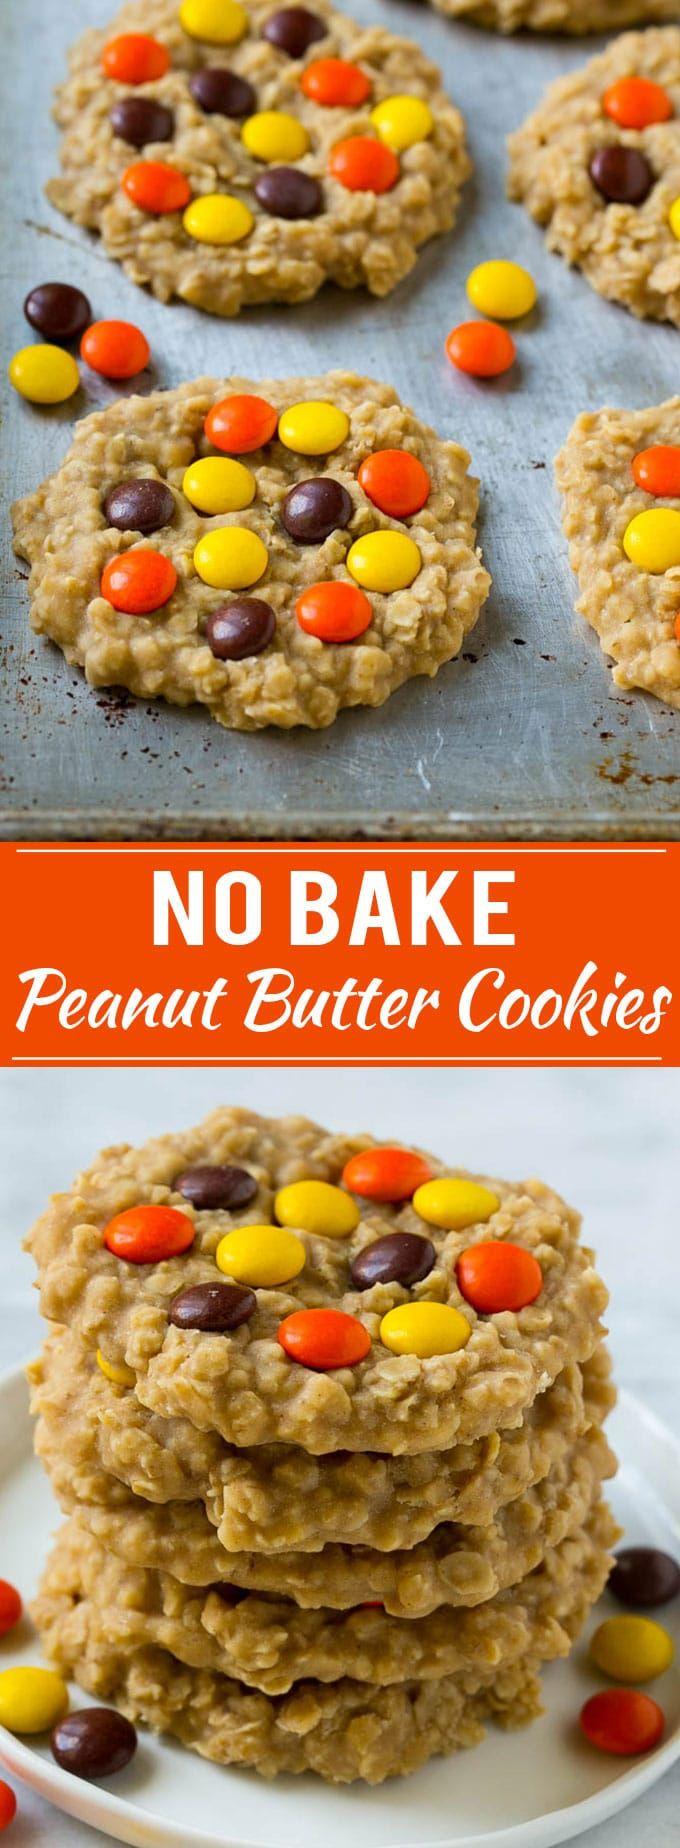 No Bake Peanut Butter Cookies Recipe   No Bake Cookies   Peanut Butter Cookies